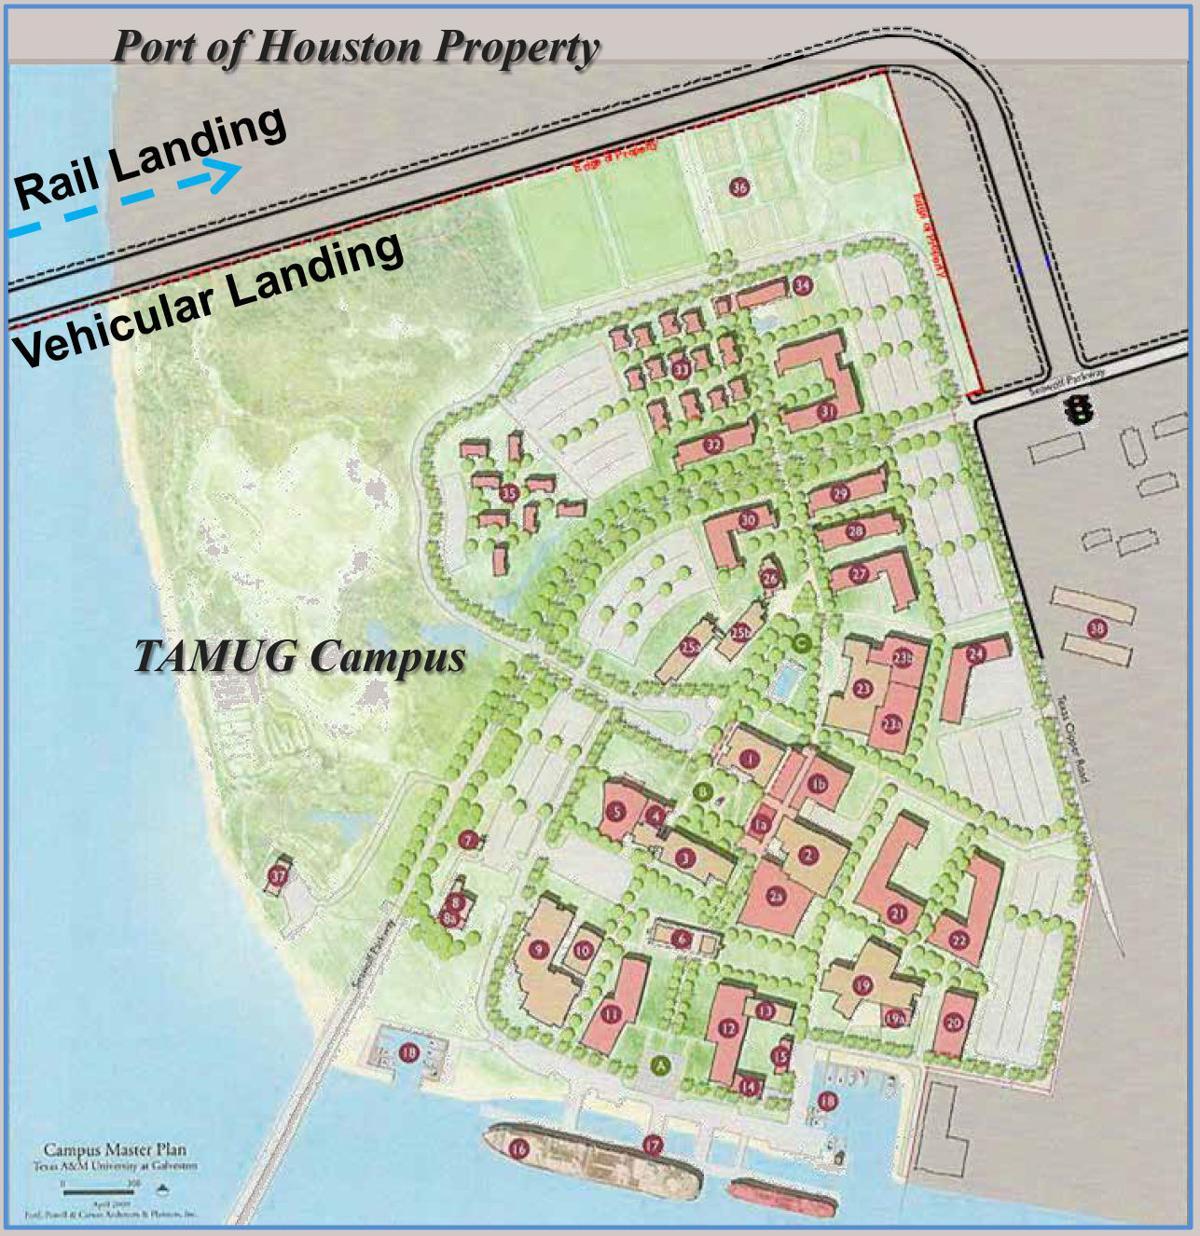 Port Of Houston Approves Agreement For Pelican Island Bridge Plan - Port of houston map